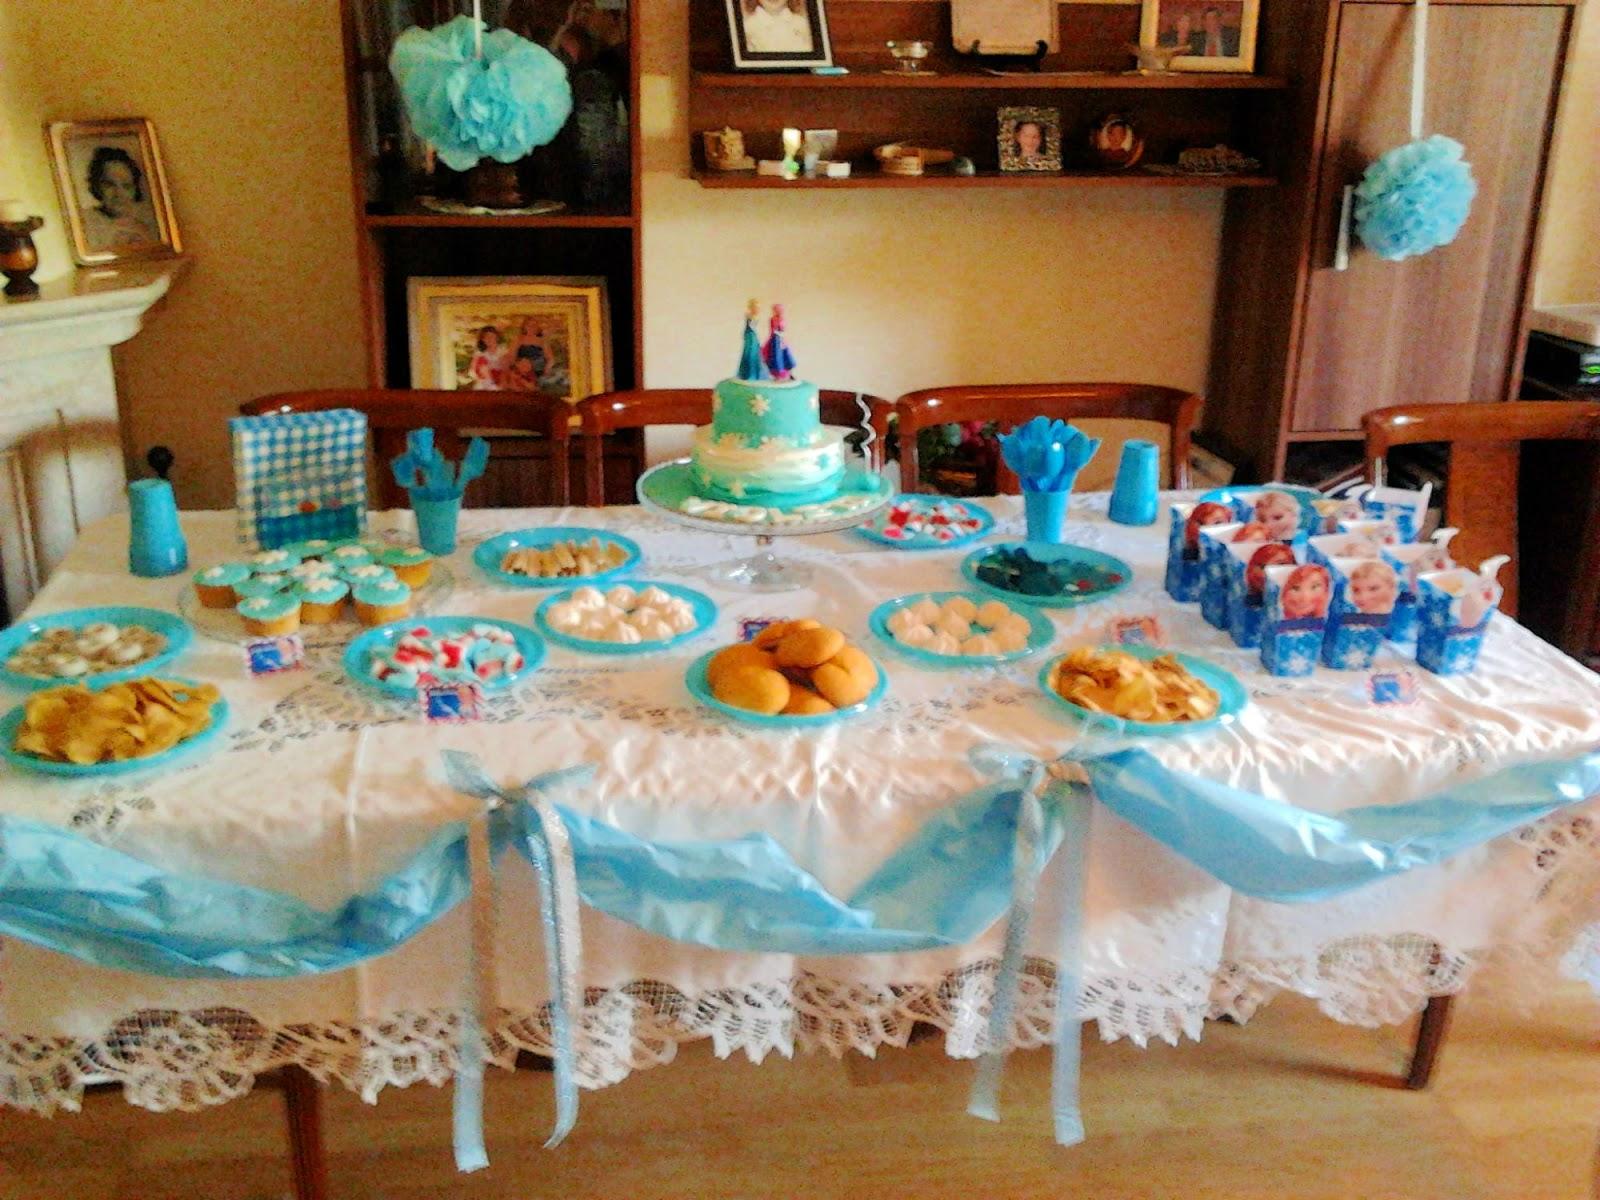 Recetas de fiesta de cumpleanos - Como decorar un cumpleanos ...